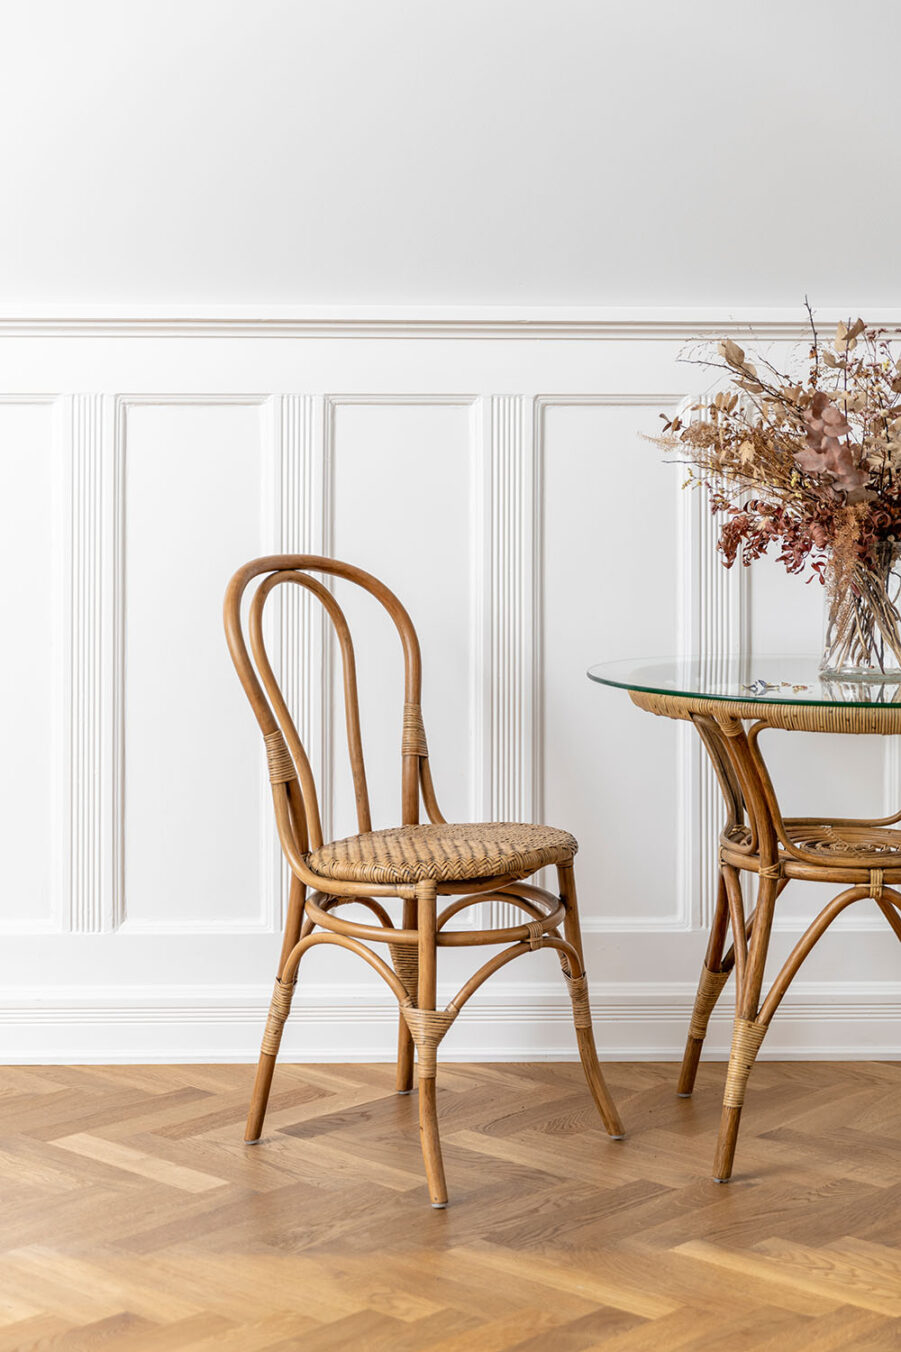 Sika-Design Lulu stol antik och Monet sidobord